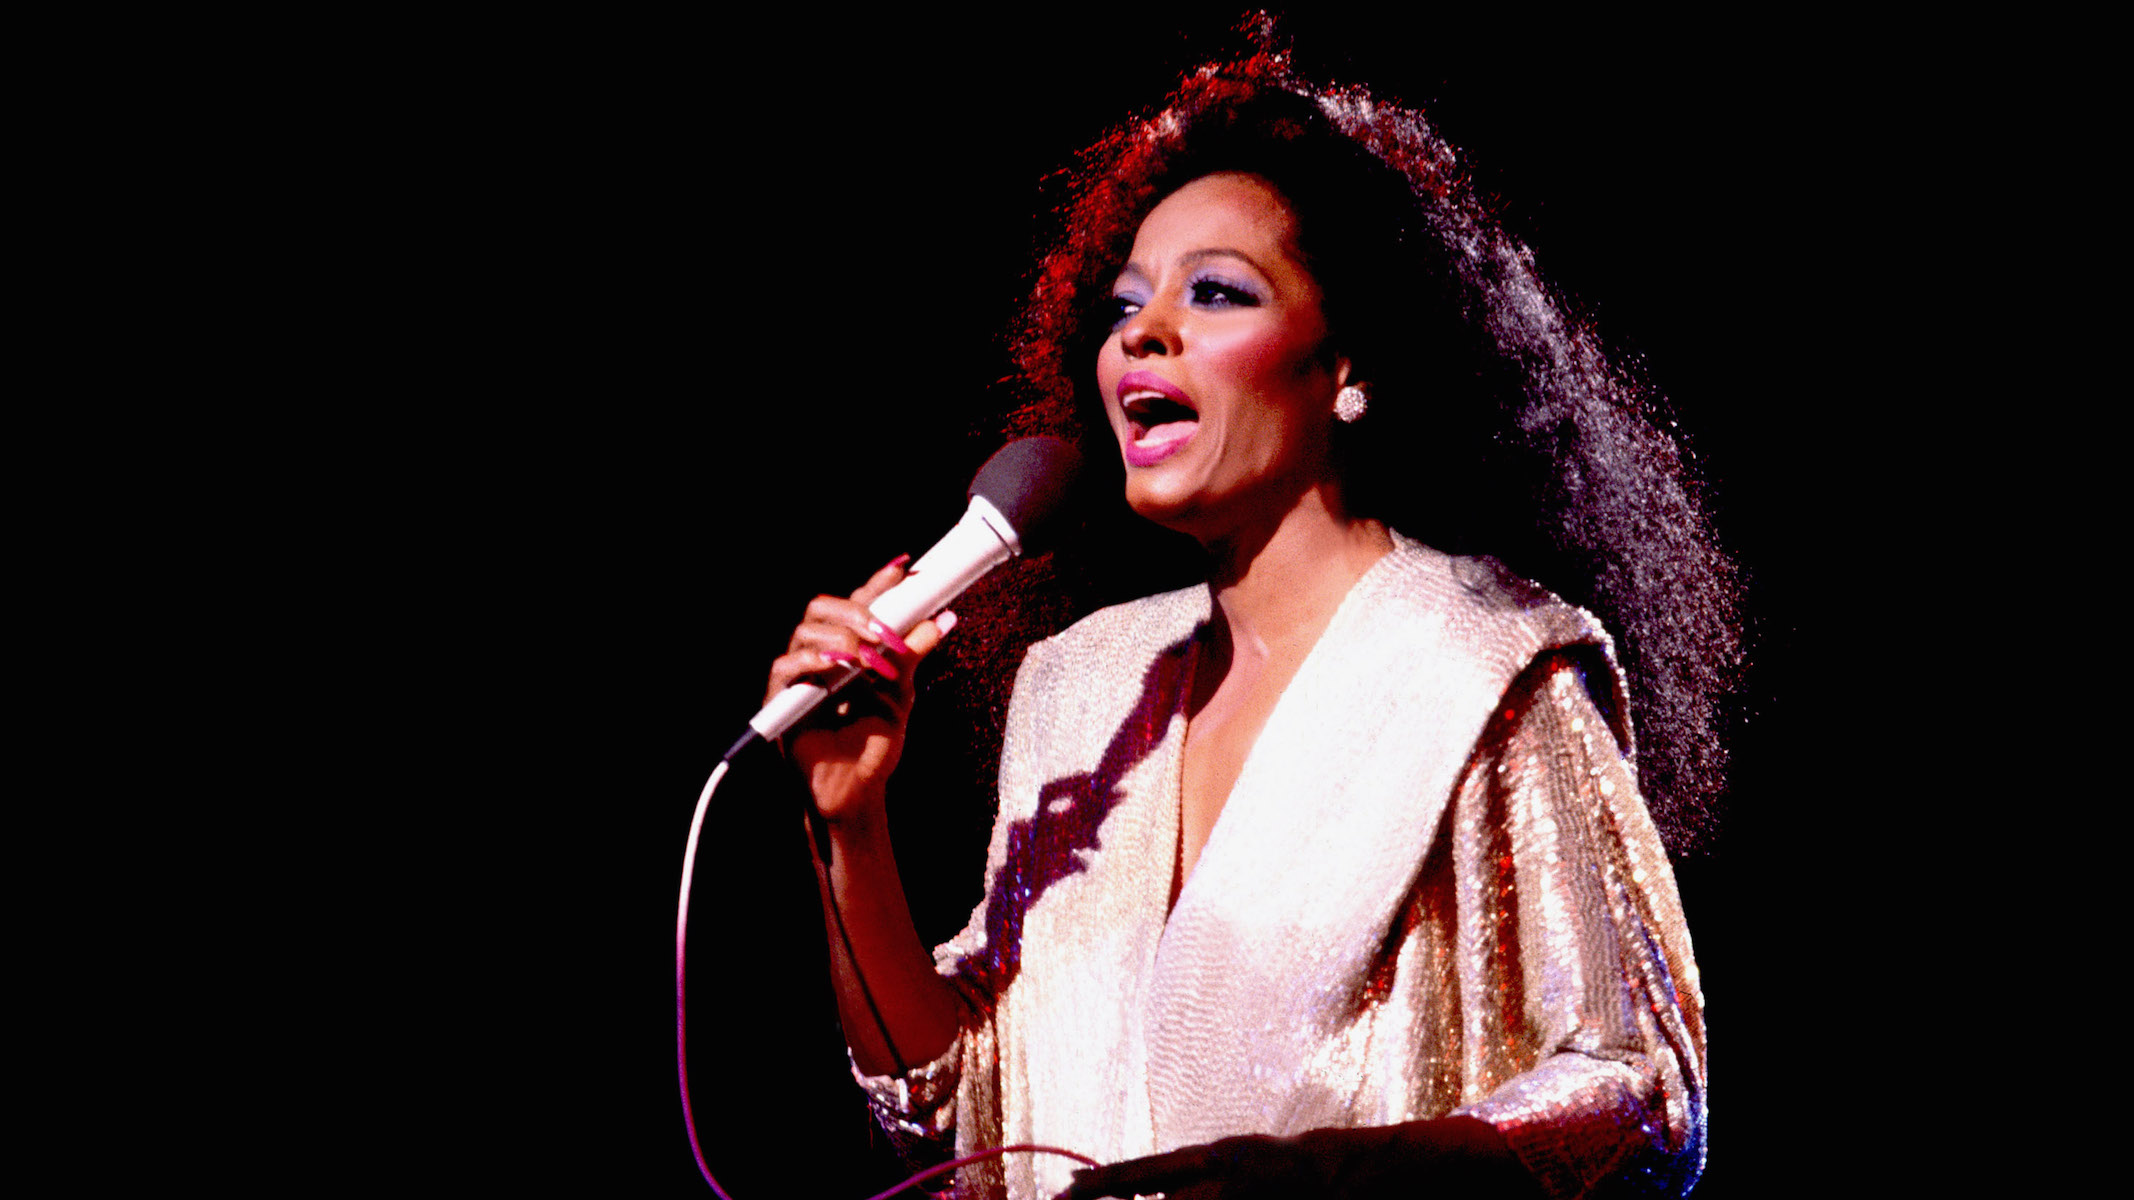 Hear Diana Ross' Famous 1983 Central Park Performance